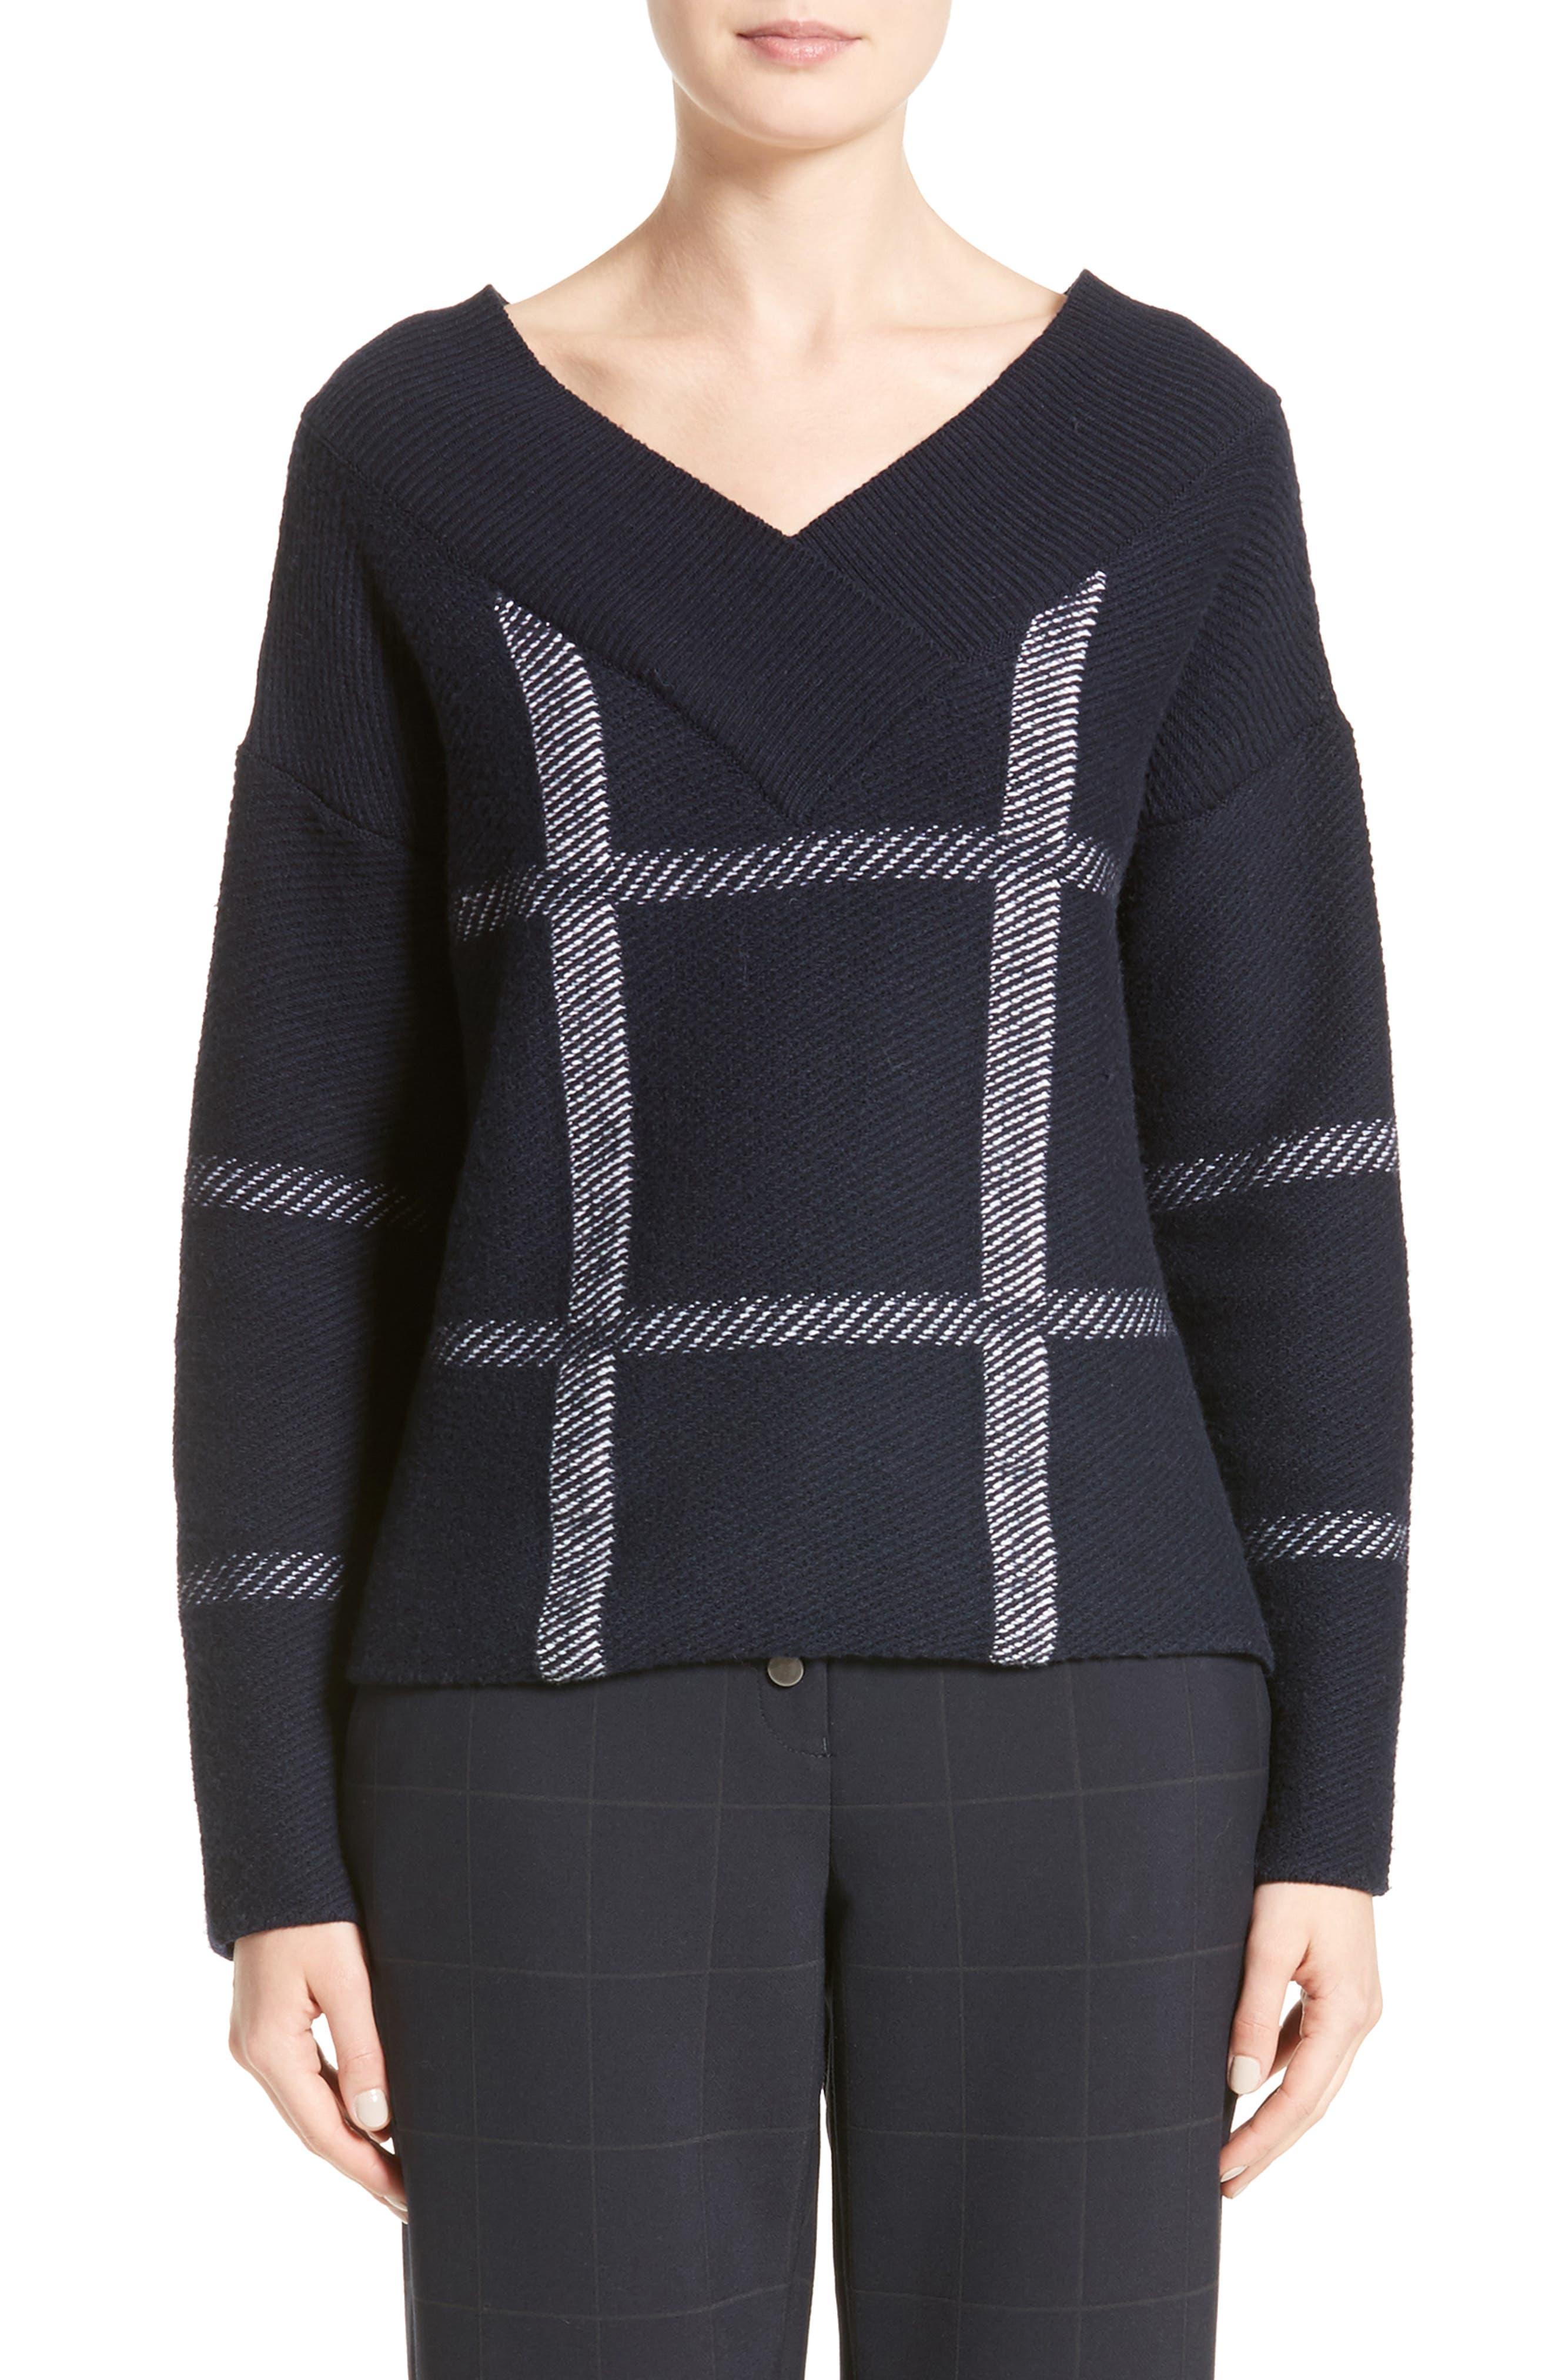 Armani Collezioni Windowpane Wool & Cashmere Sweater